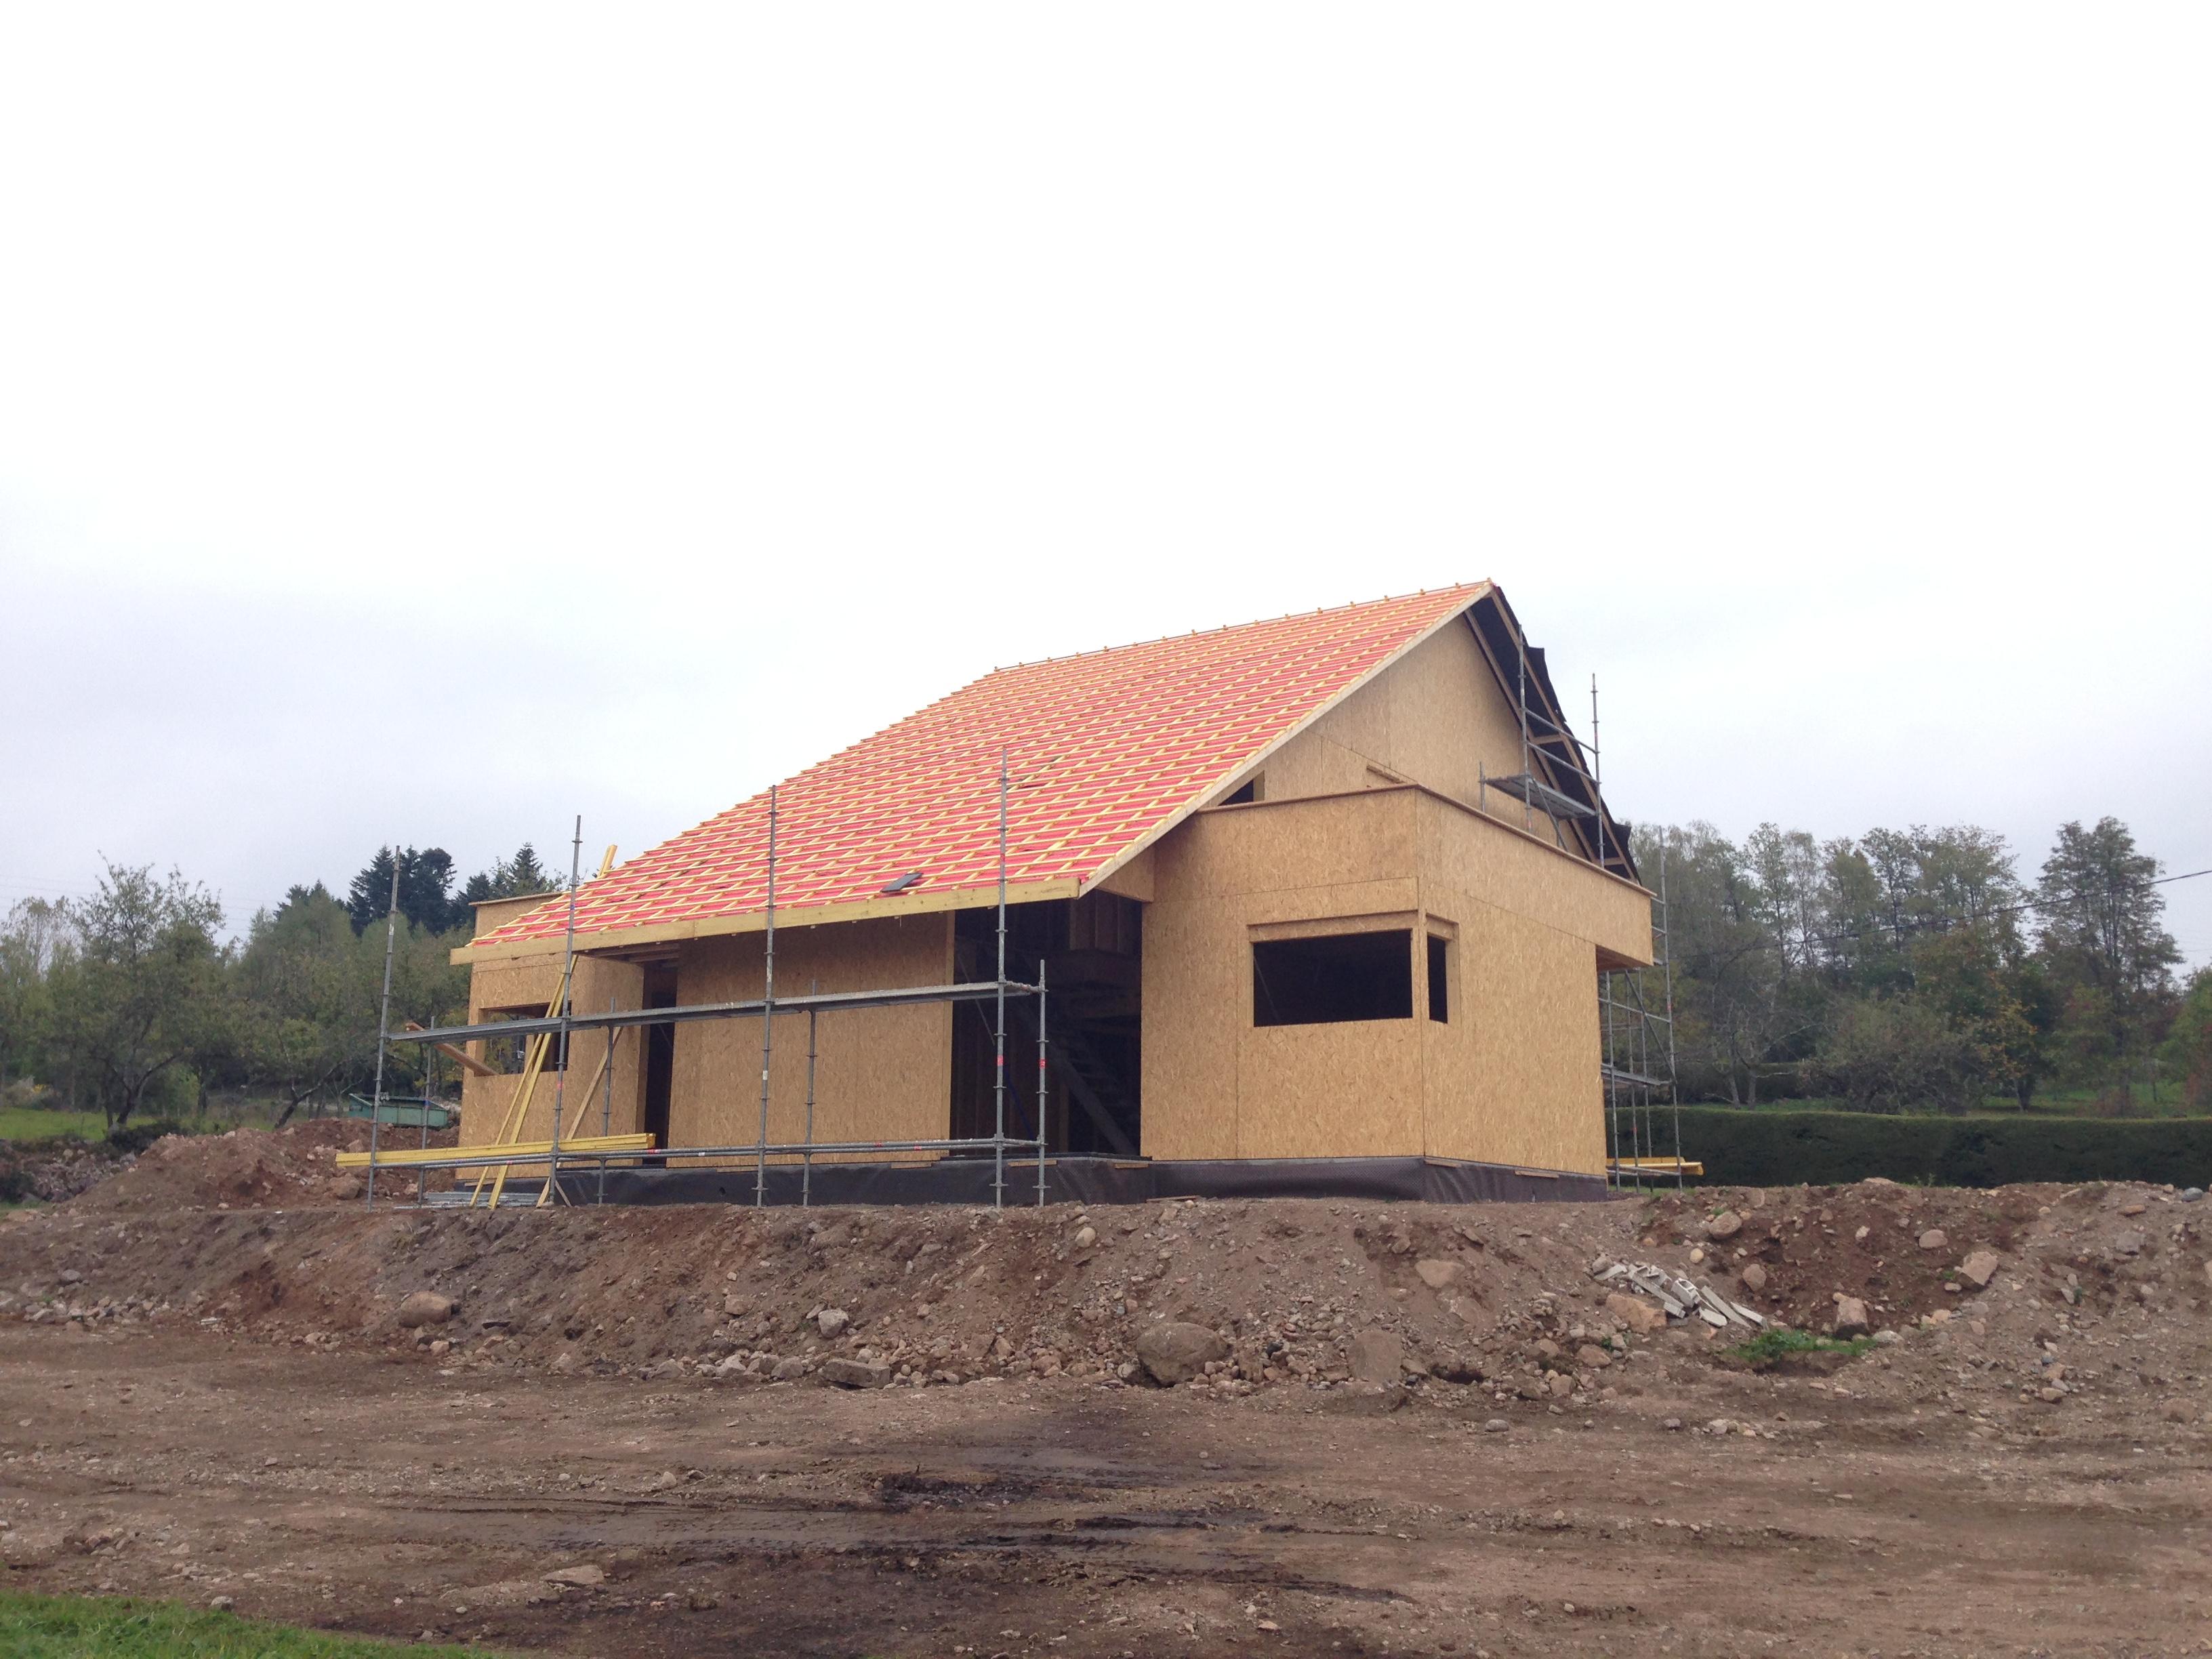 Maison ossature bois - Pinot 3d - Durand